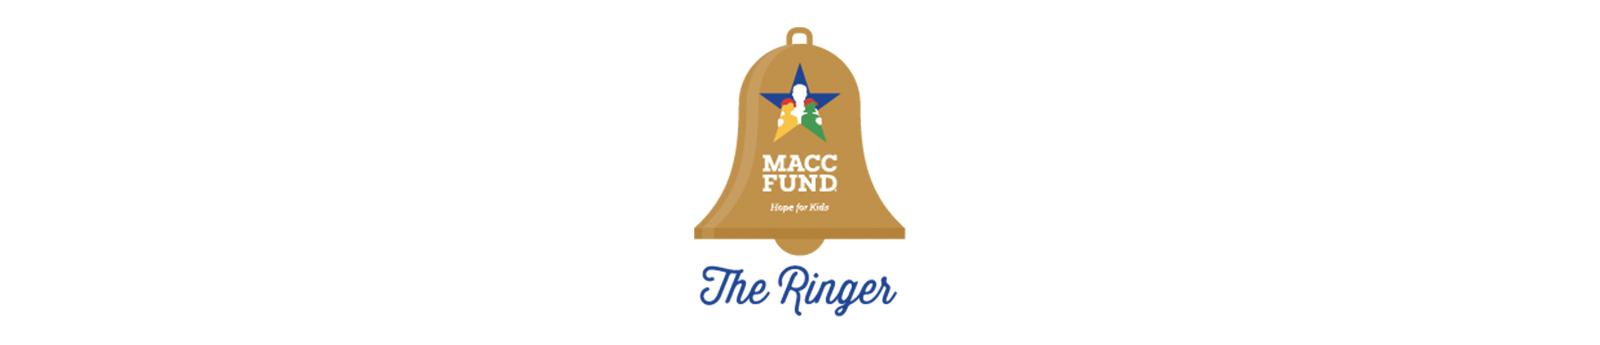 MACC Fund - The Ringer